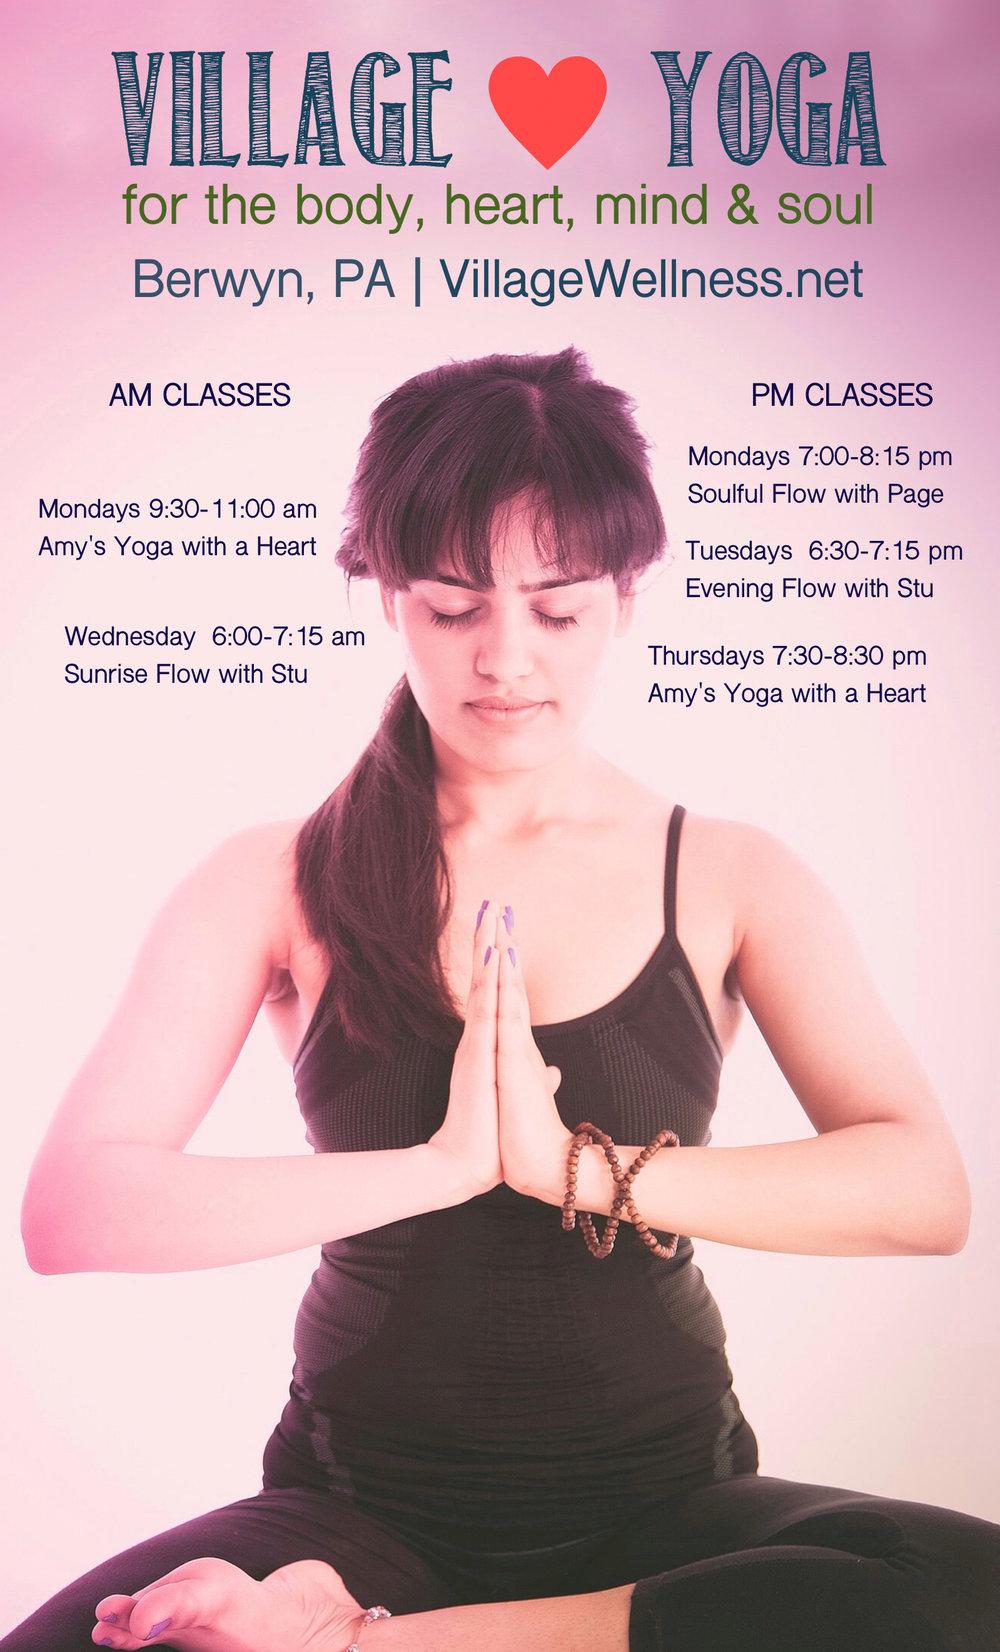 Mainline yoga